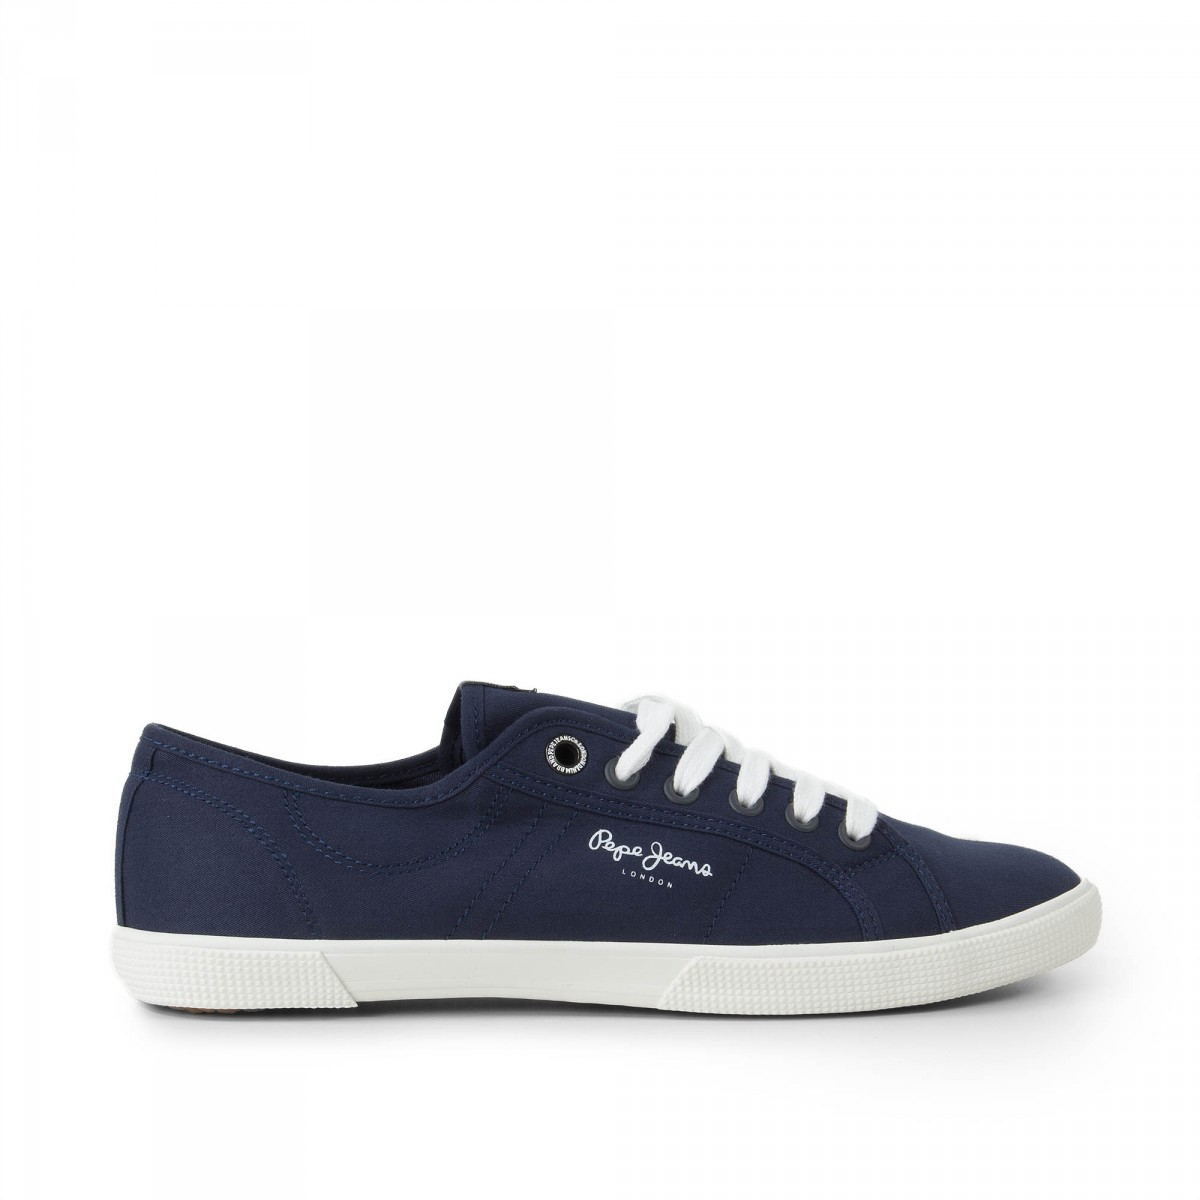 size 40 b9040 d22ae tennis-en-toile-homme-aberman-pepe-jeans.jpg